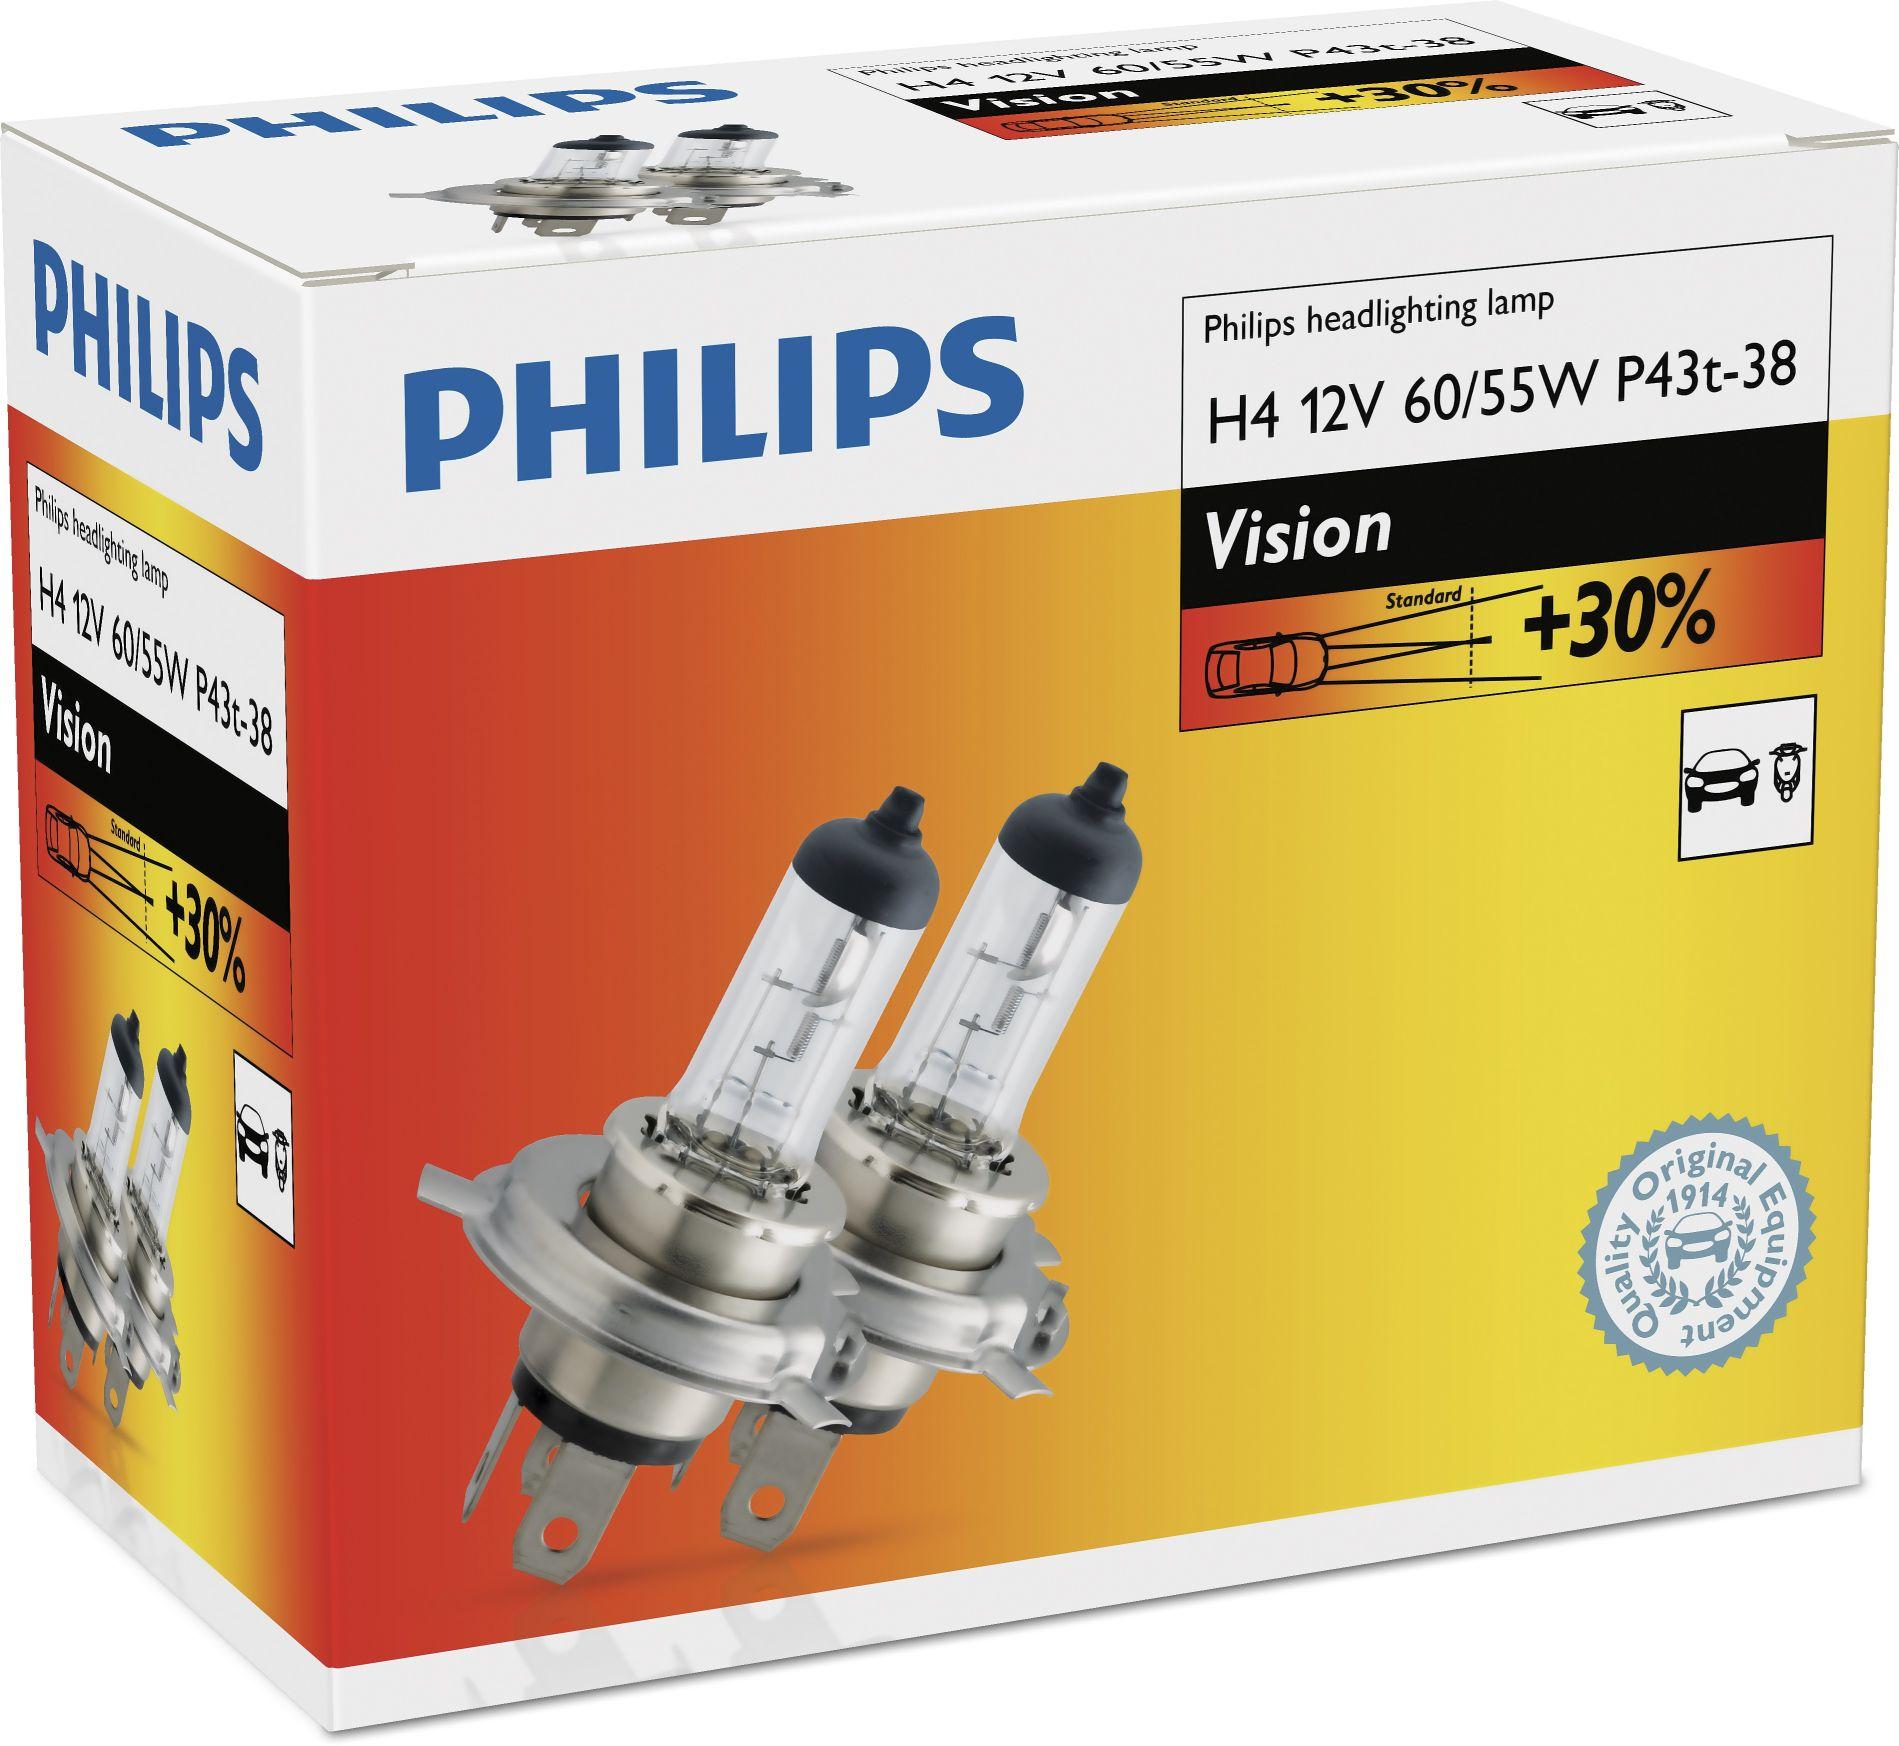 Žárovky 12V H4 60/55W Philips Vision +30% 2ks duopack